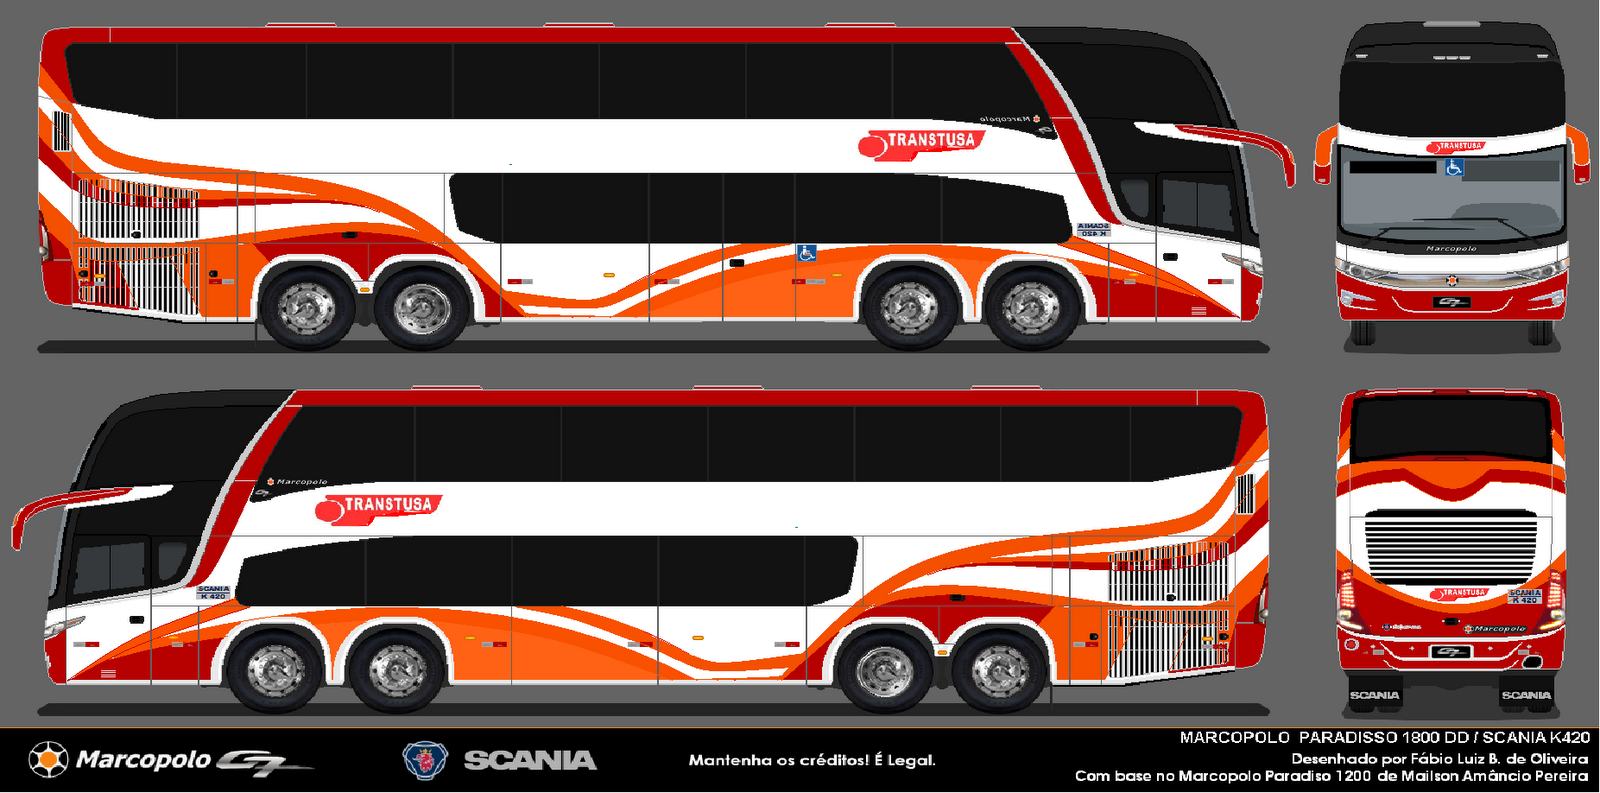 Dibujos de autobuses de costa rica galeria 03 2011 - Autobuses larga distancia ...